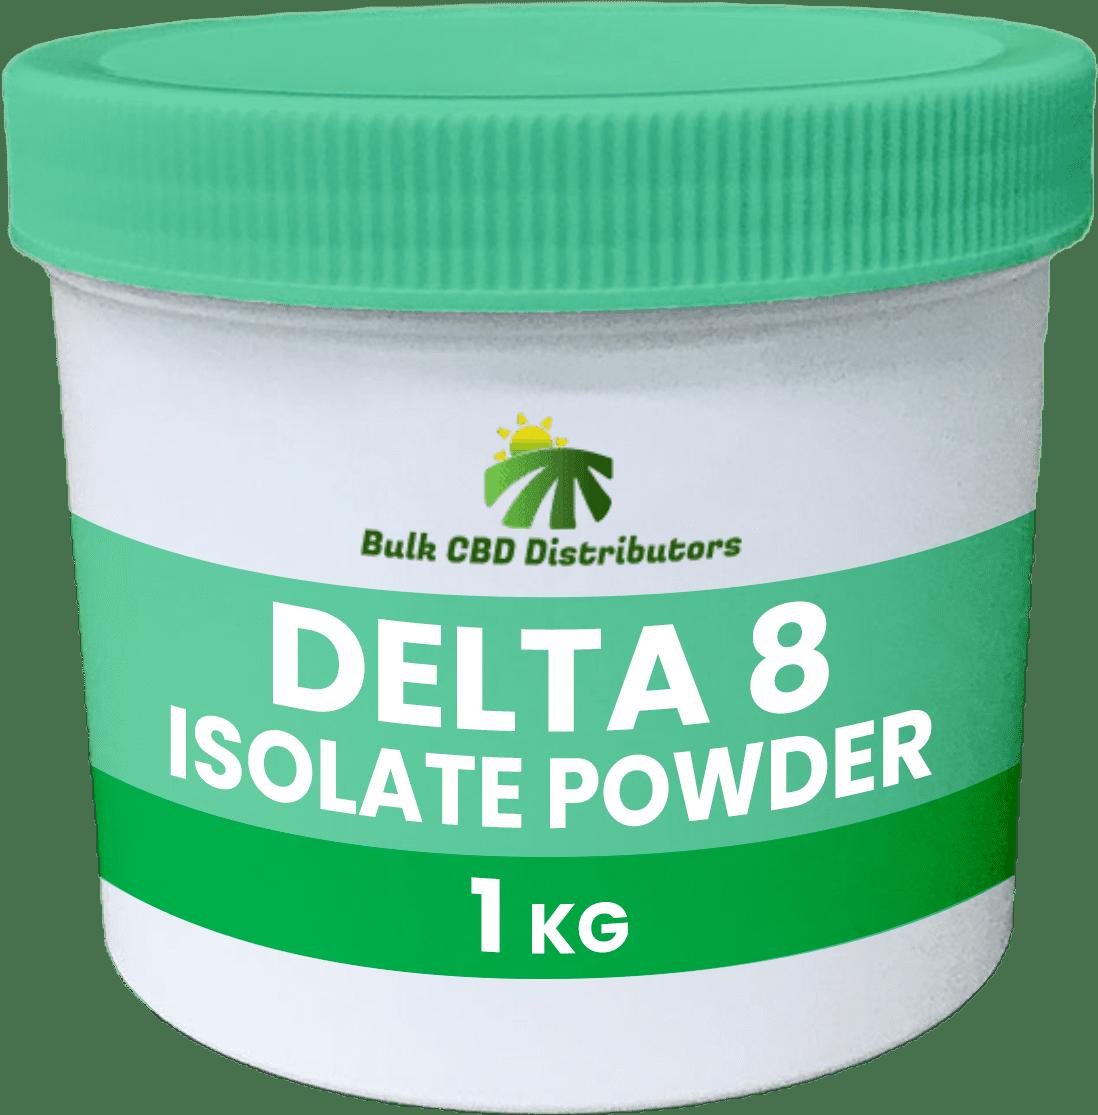 Bulk Delta 8 Isolate